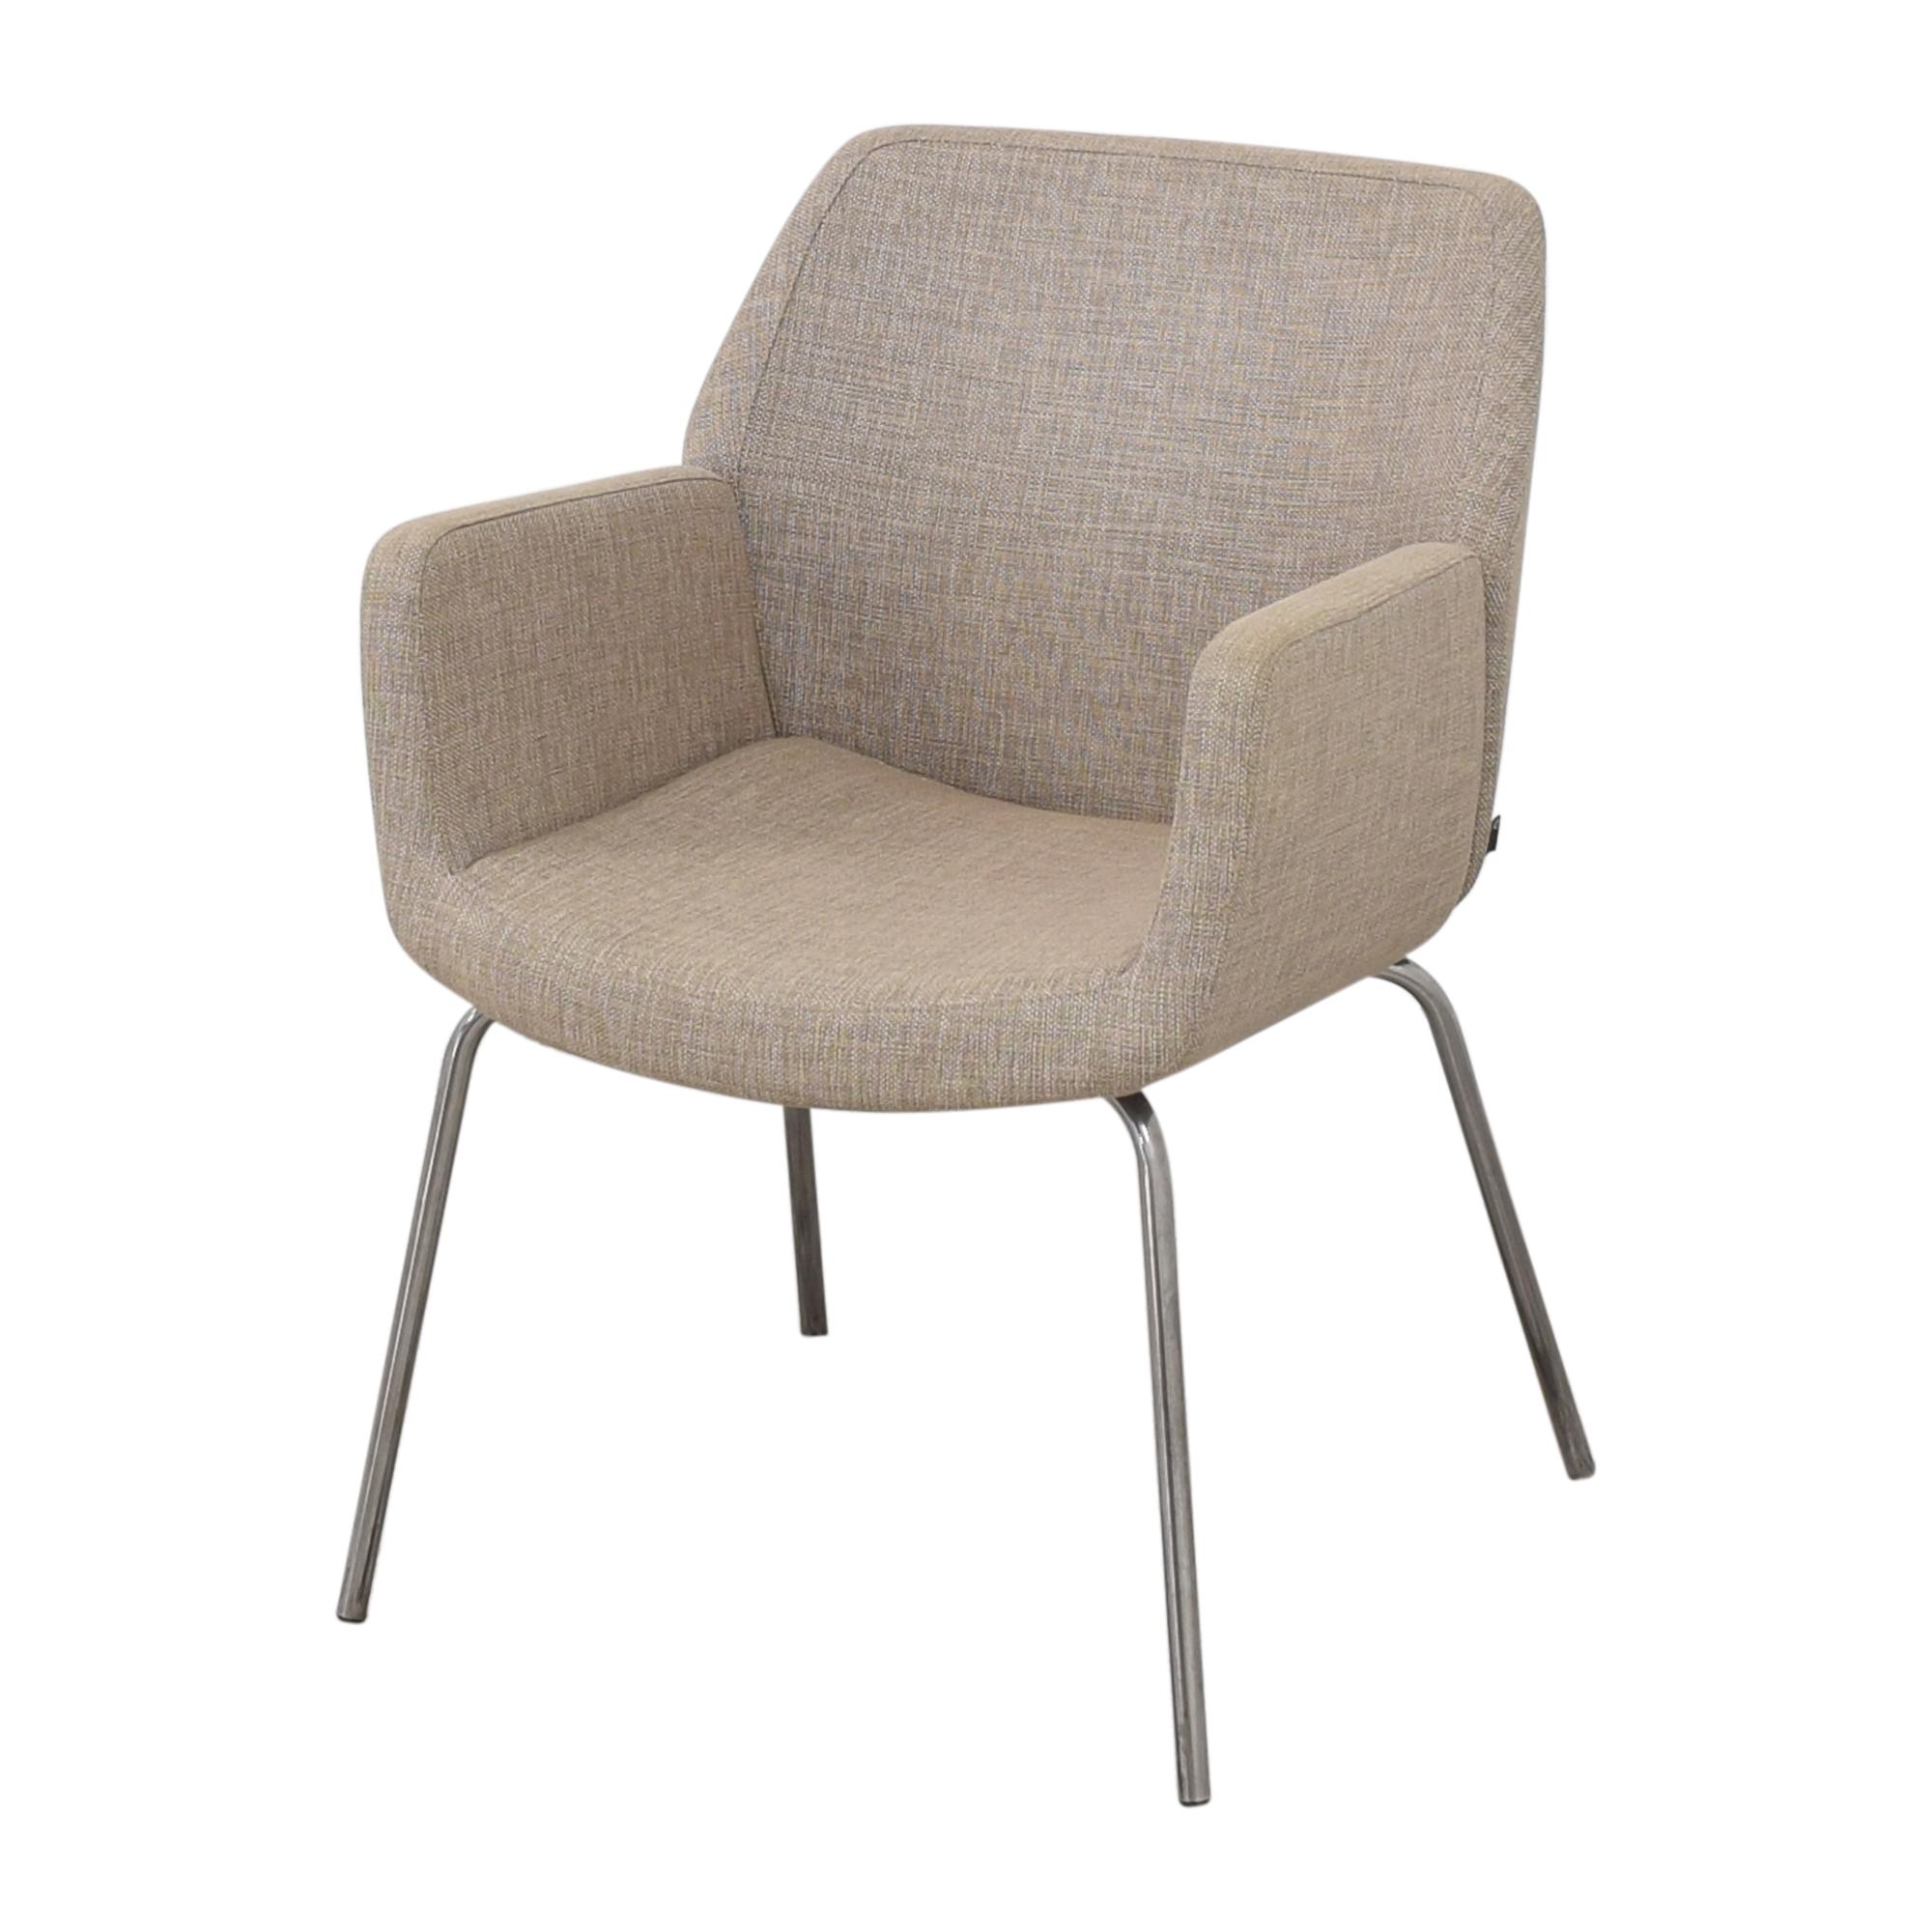 Steelcase Steelcase Coalesse Bindu Side Chair nj